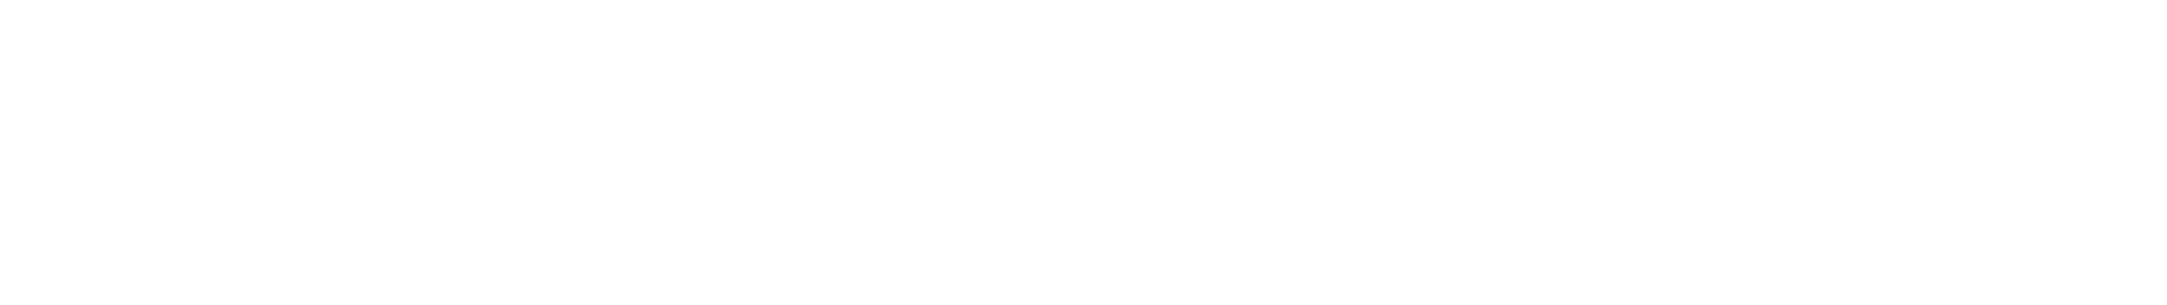 Socialblog Anwaltsportal24